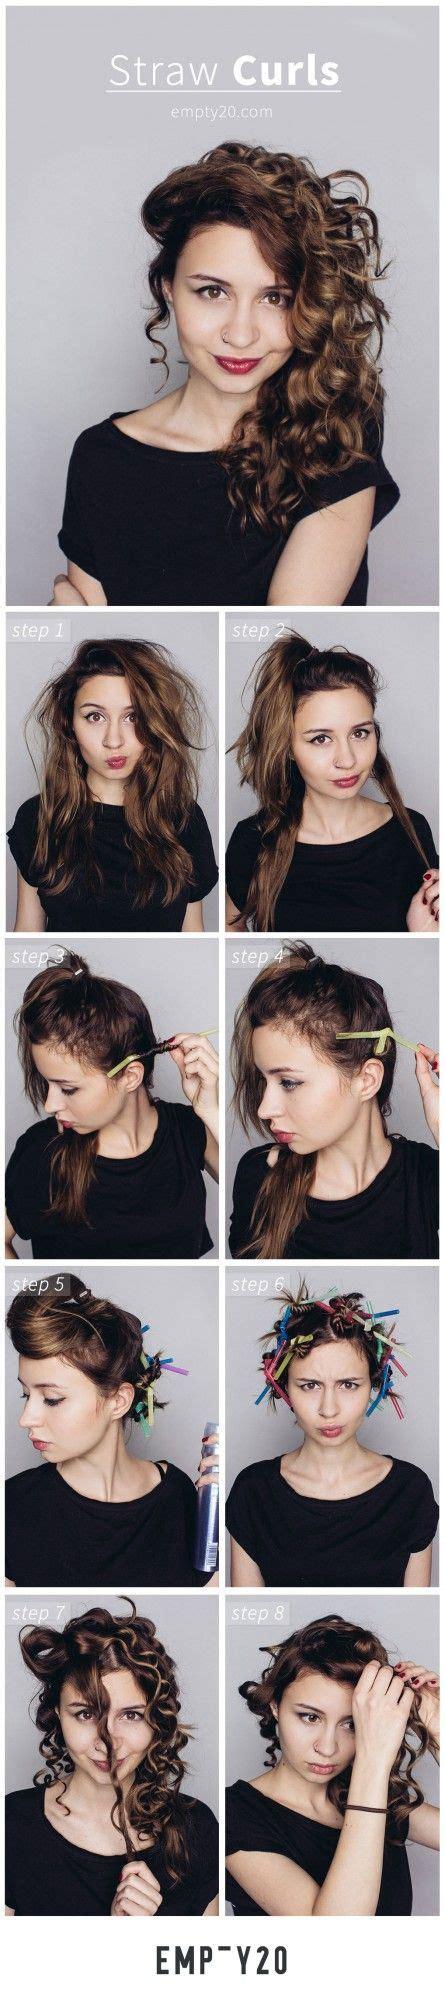 heatless hairstyles tutorials best 25 straw curls ideas on pinterest tight curly hair